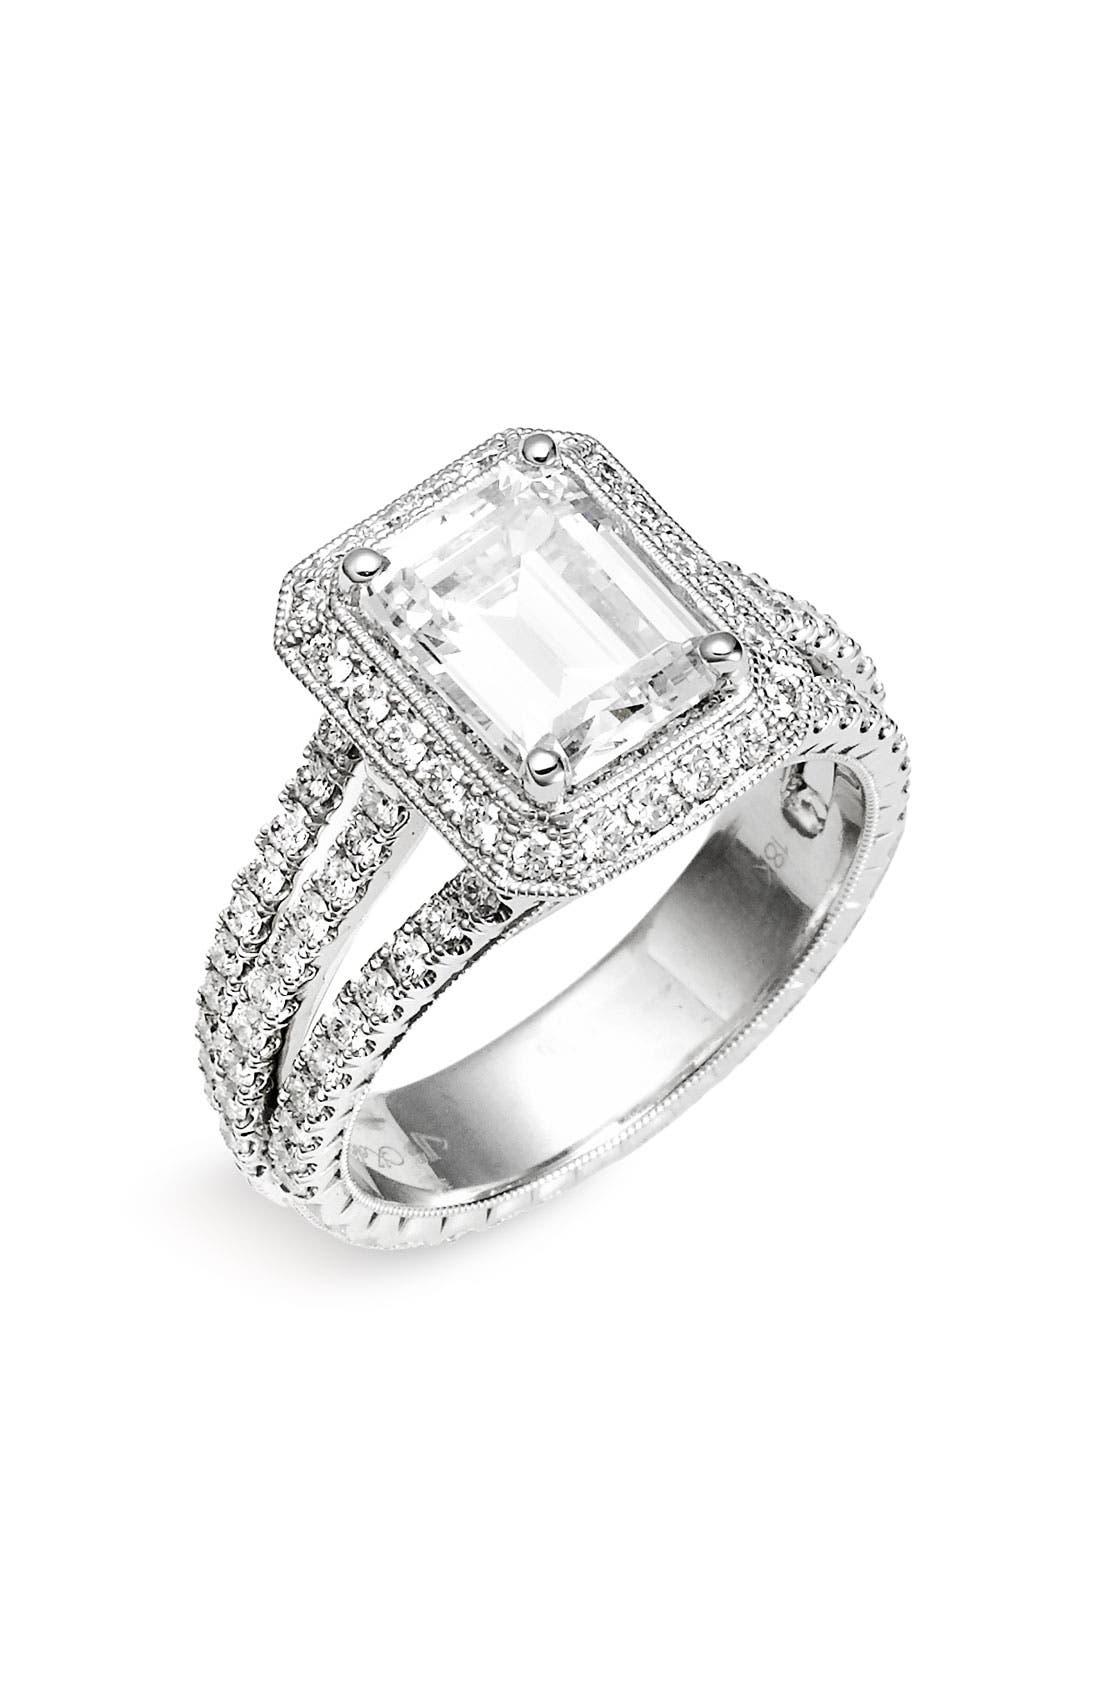 Alternate Image 1 Selected - Jack Kelége 'Romance' Emerald Cut Diamond Engagement Ring Setting